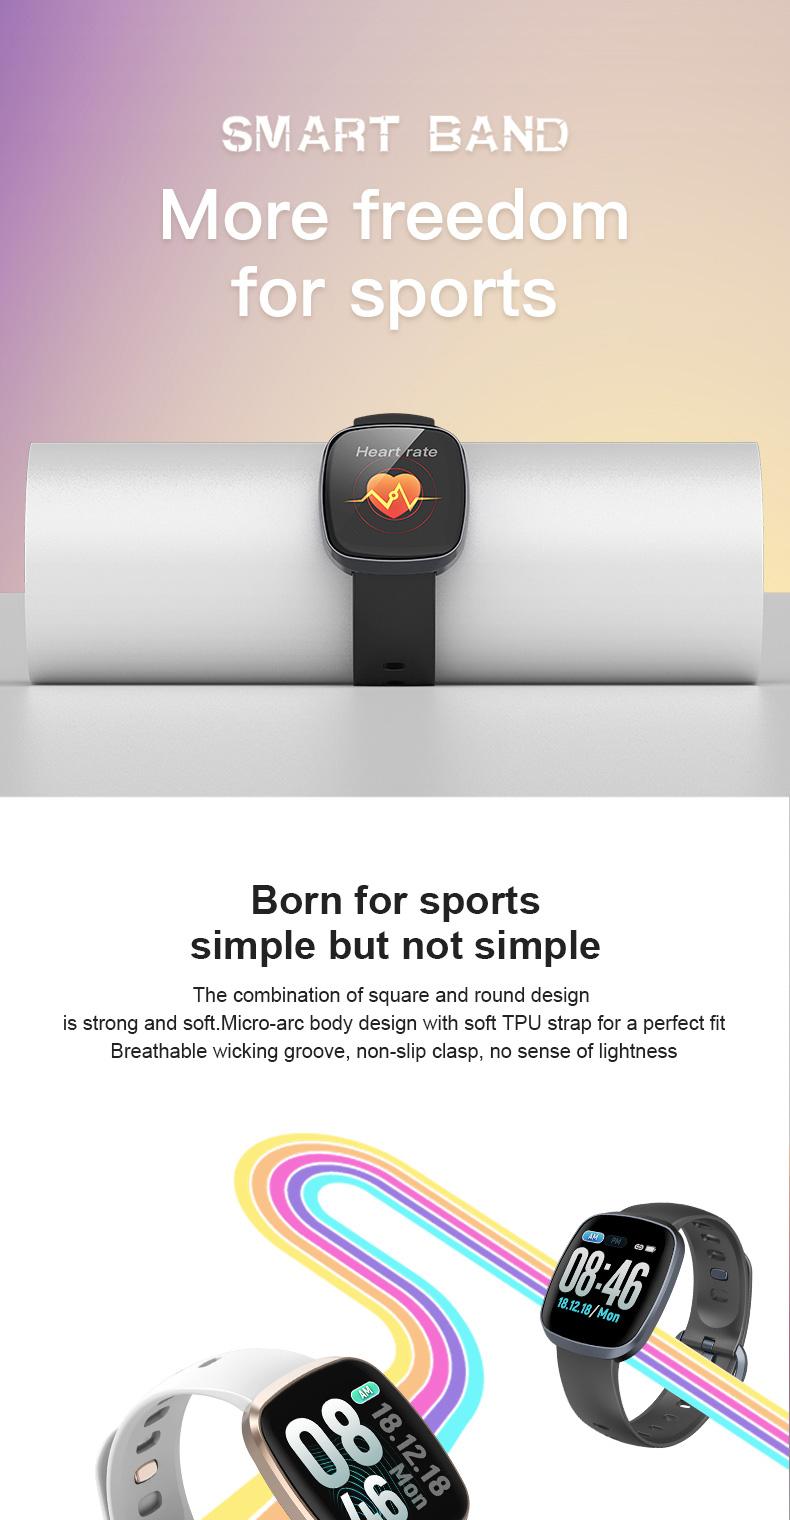 GT103 Waterproof IP67 digital smart watch with 1.3'' touch display